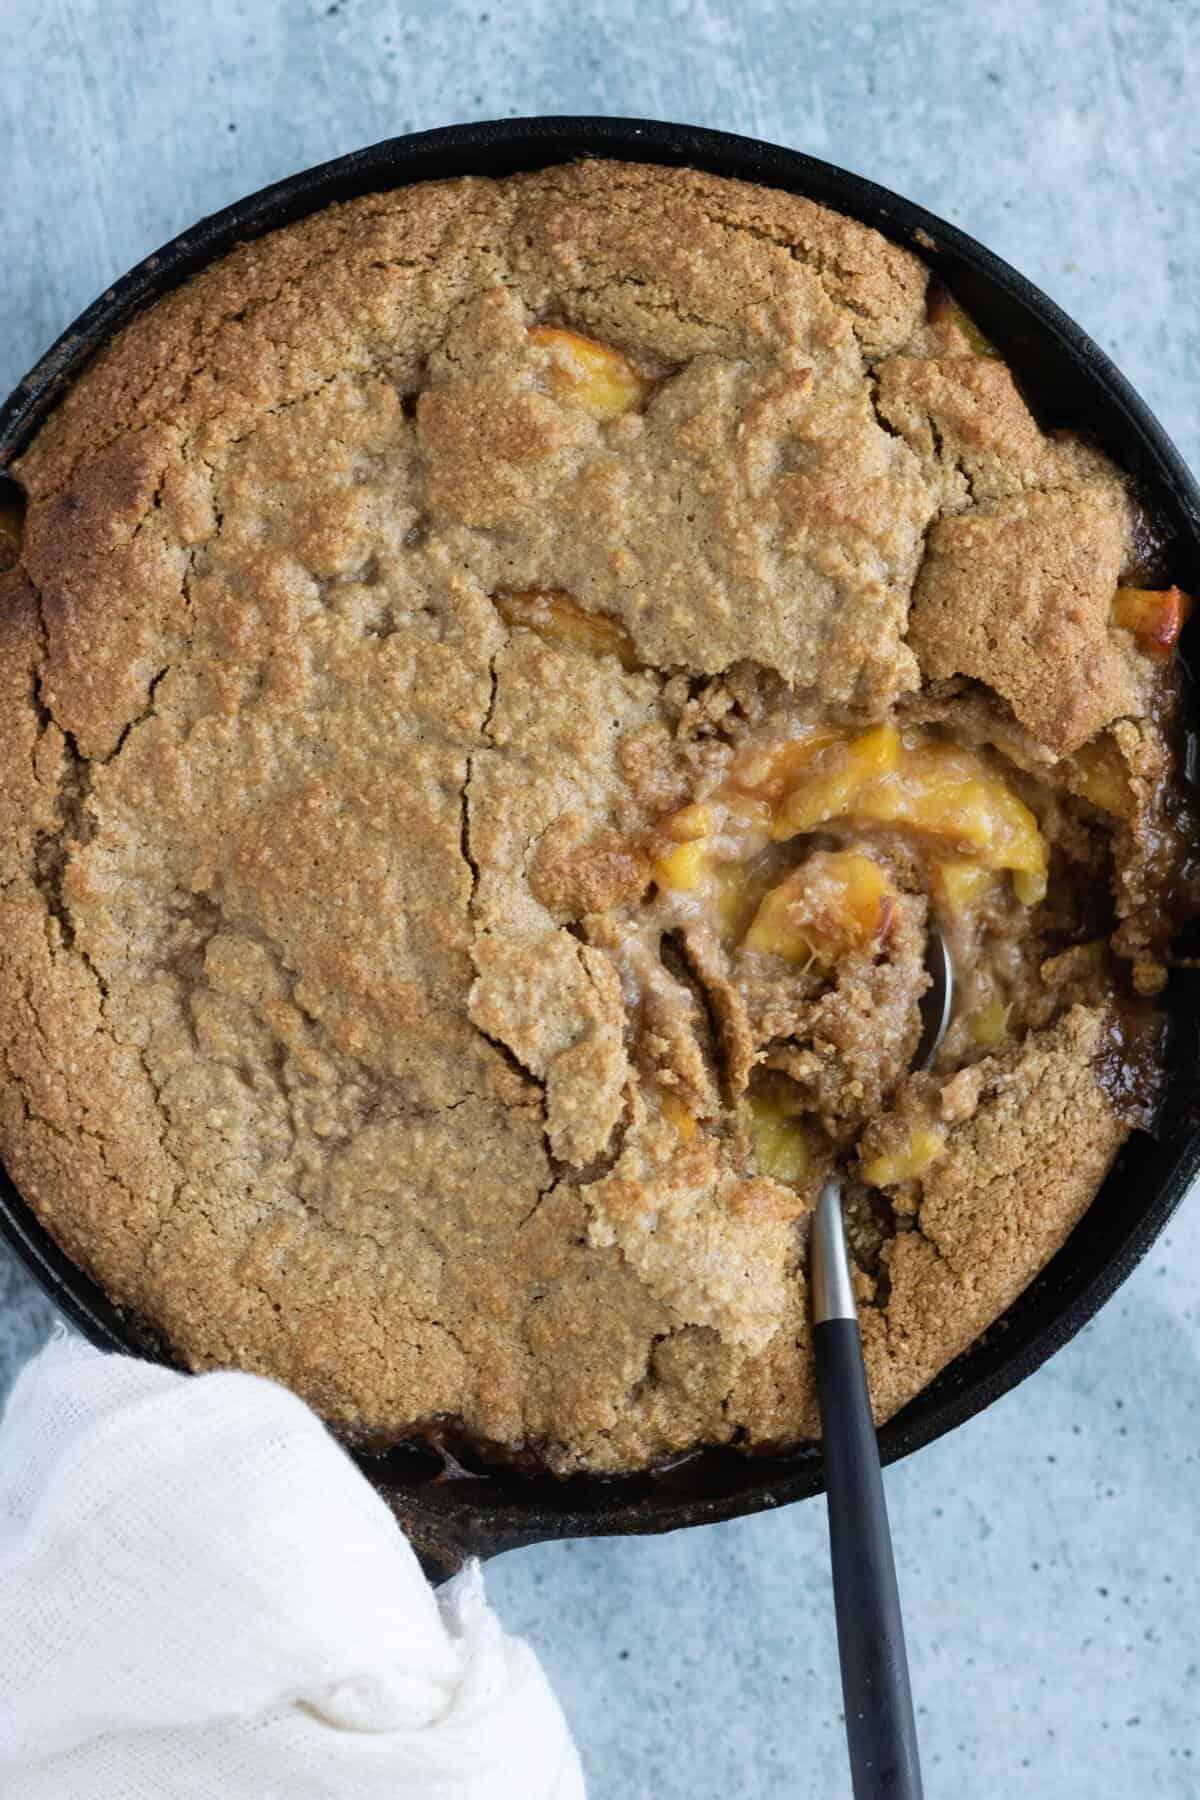 Vegan Gluten-Free Peach Cobbler Recipe